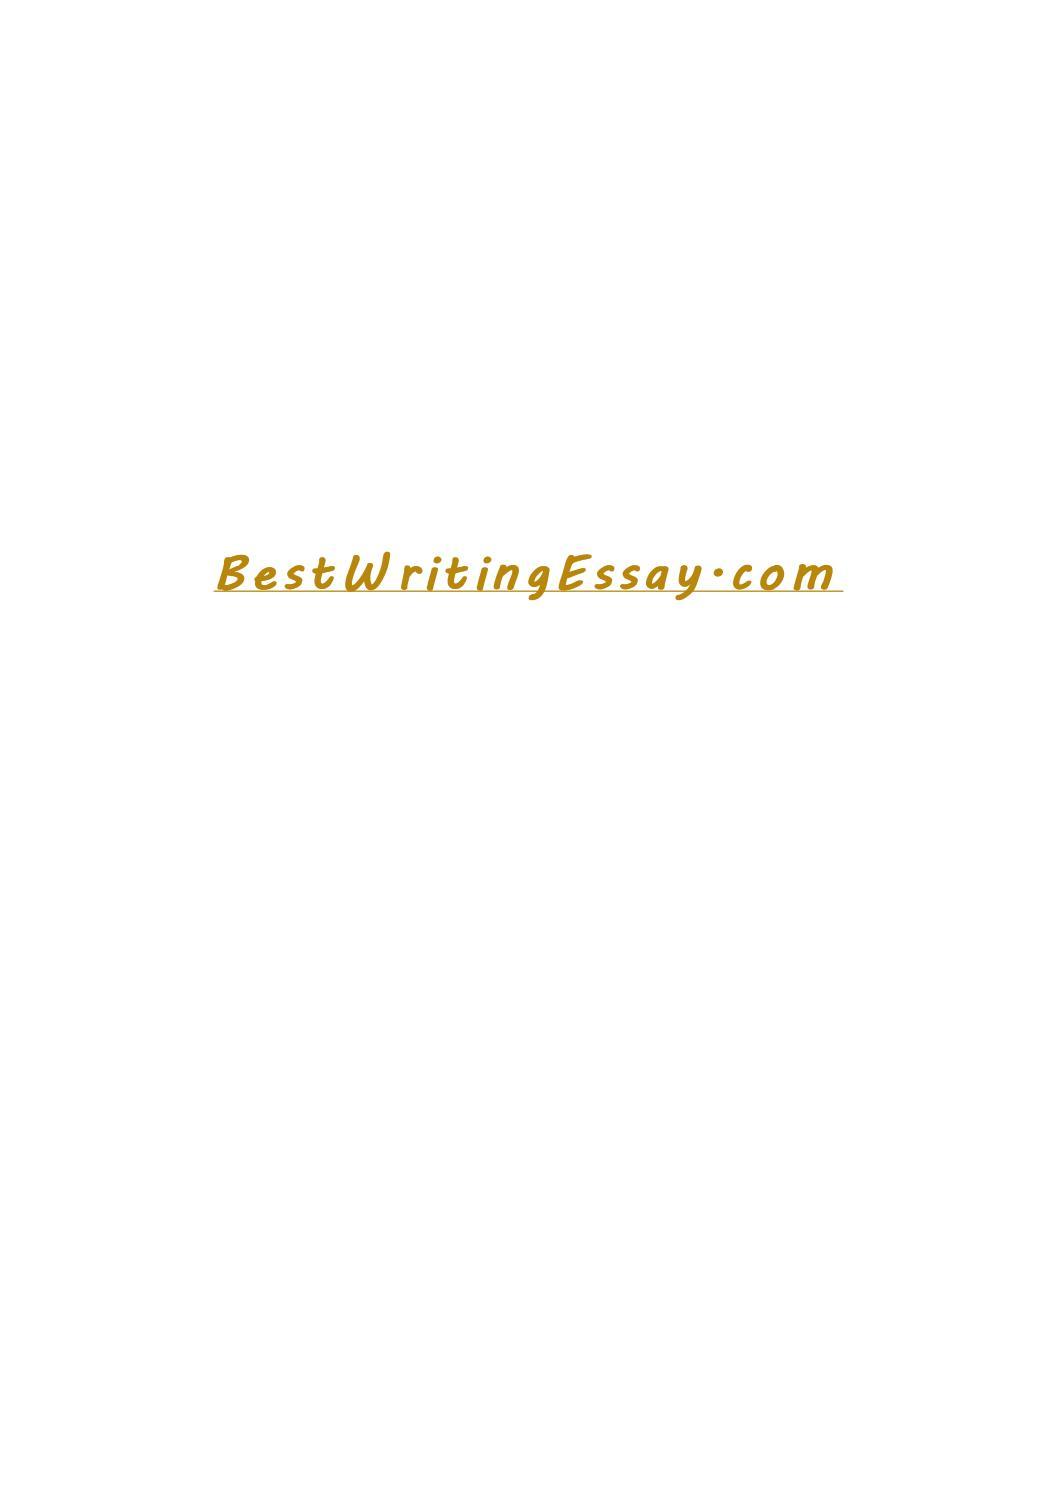 Custom college critical essay help